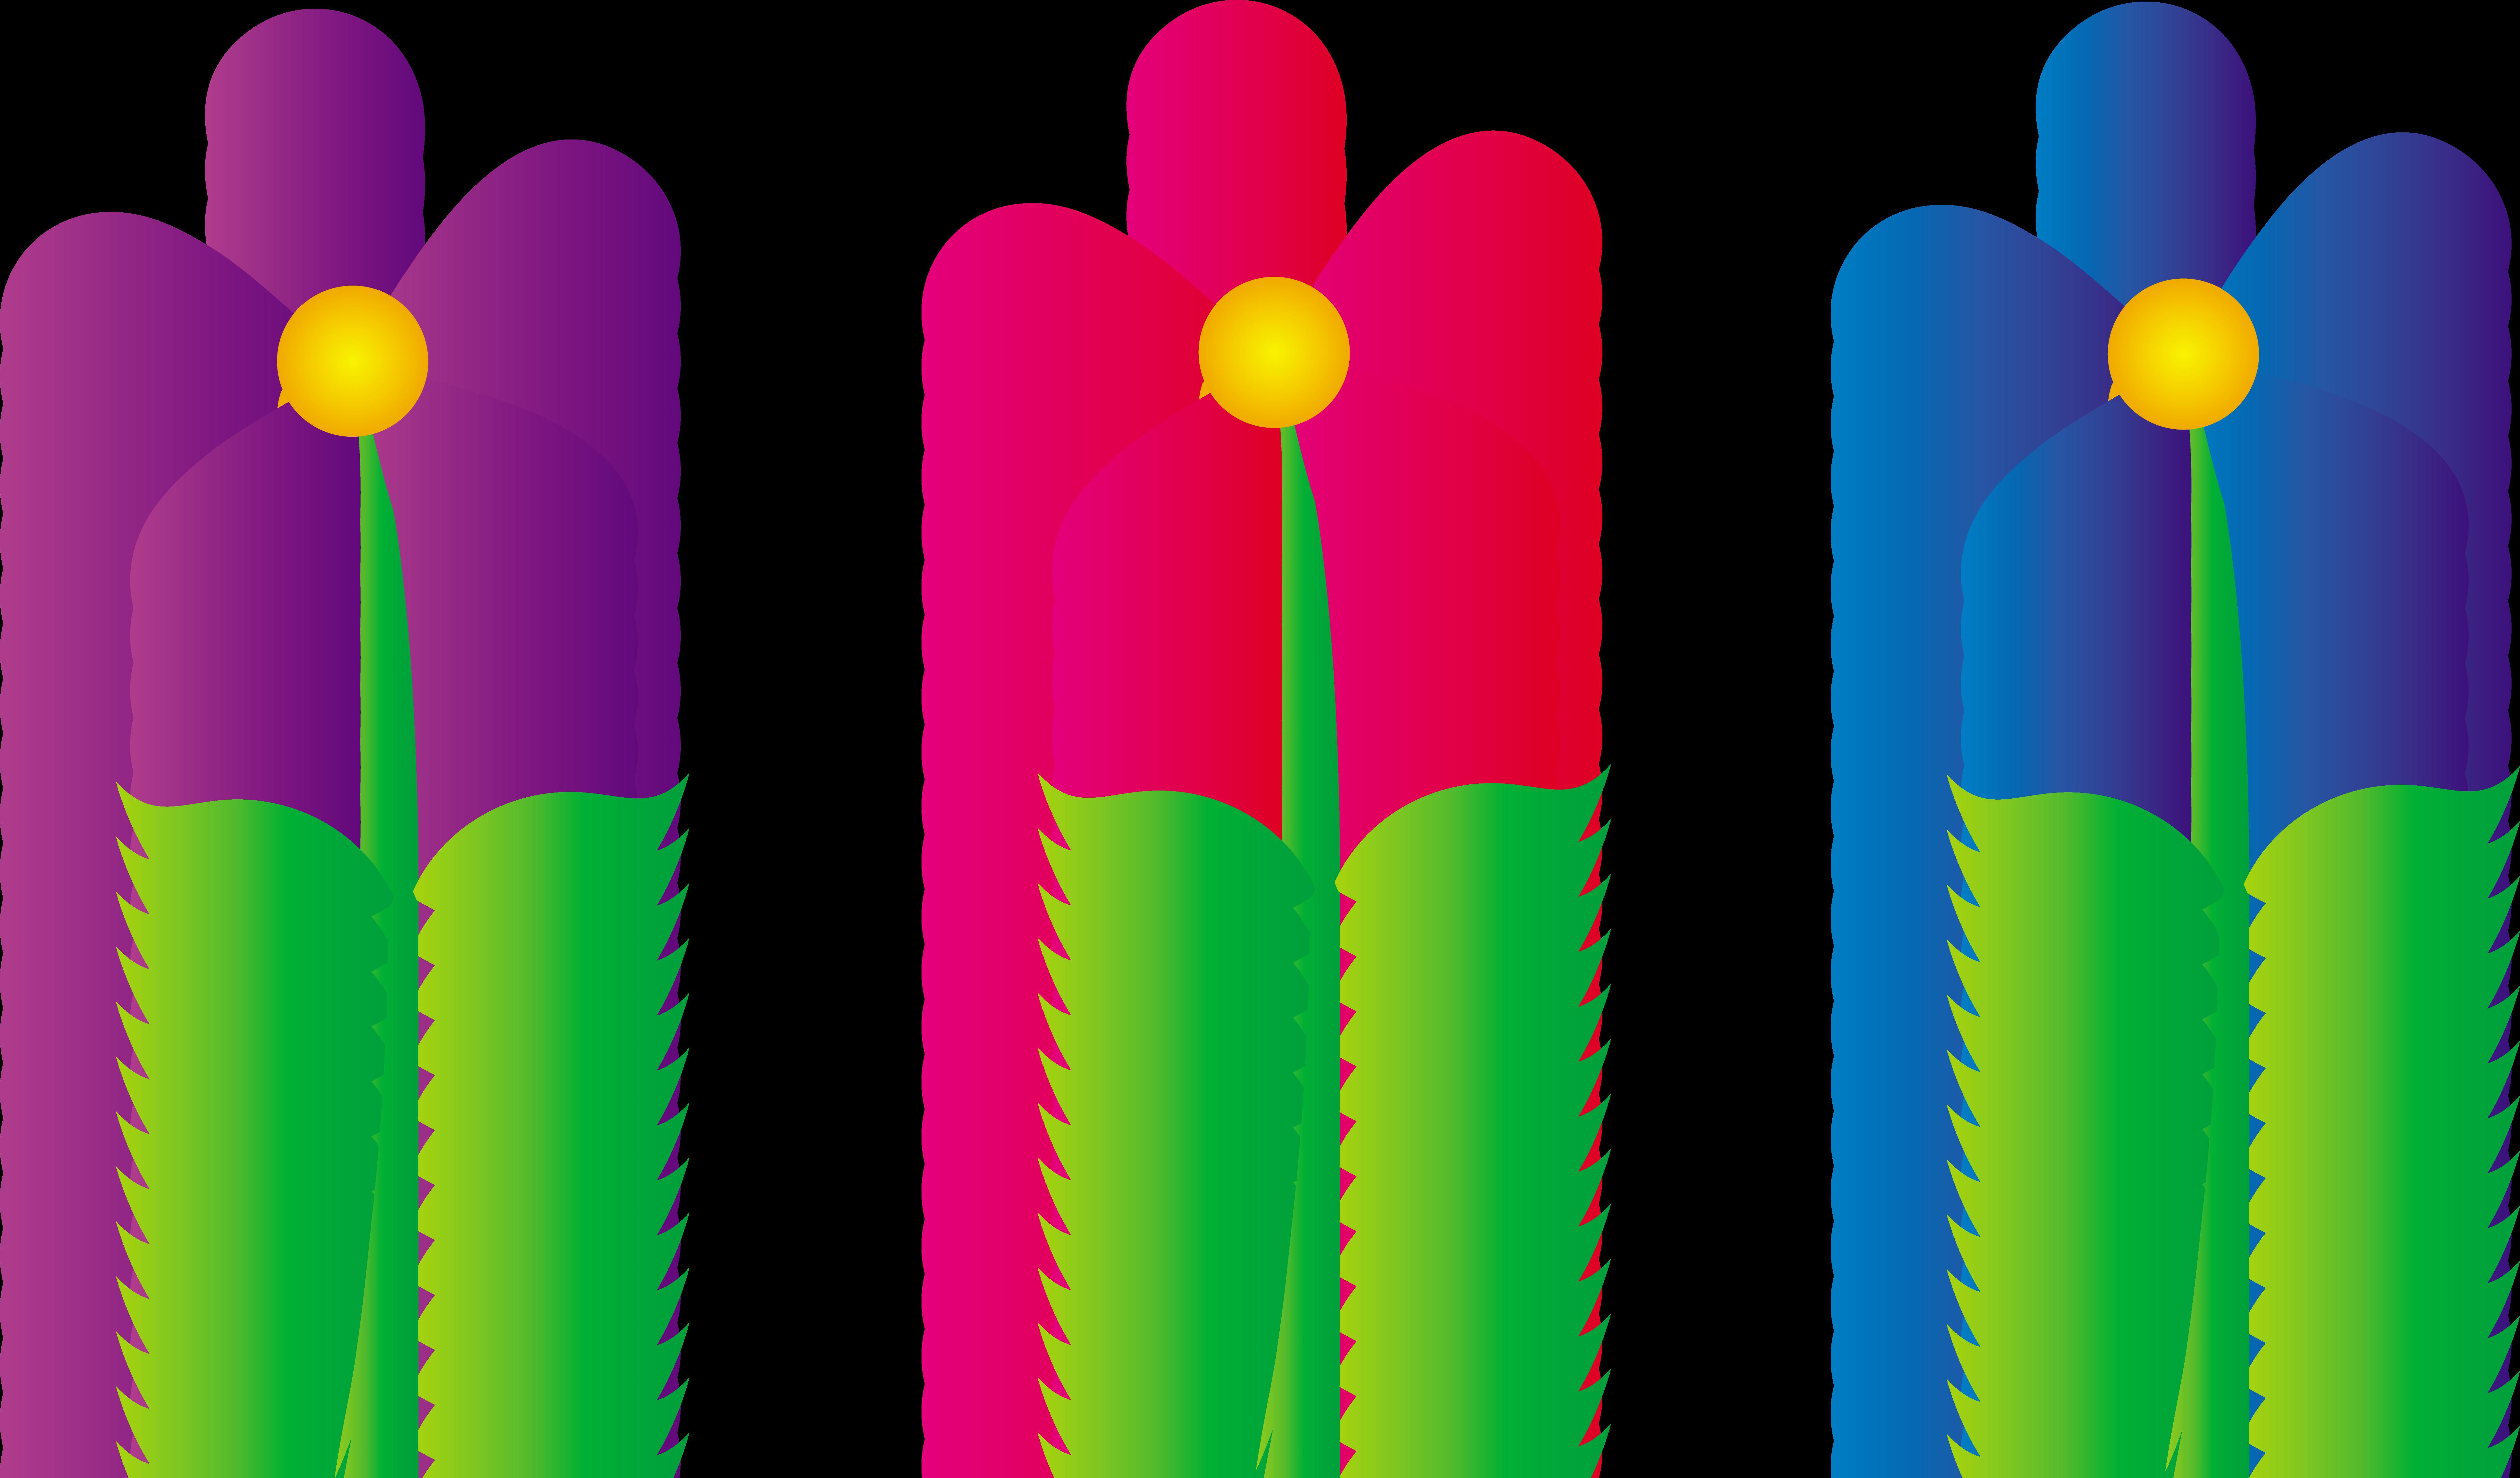 7747x4545 Flowers Clip Art Border Clipart Panda